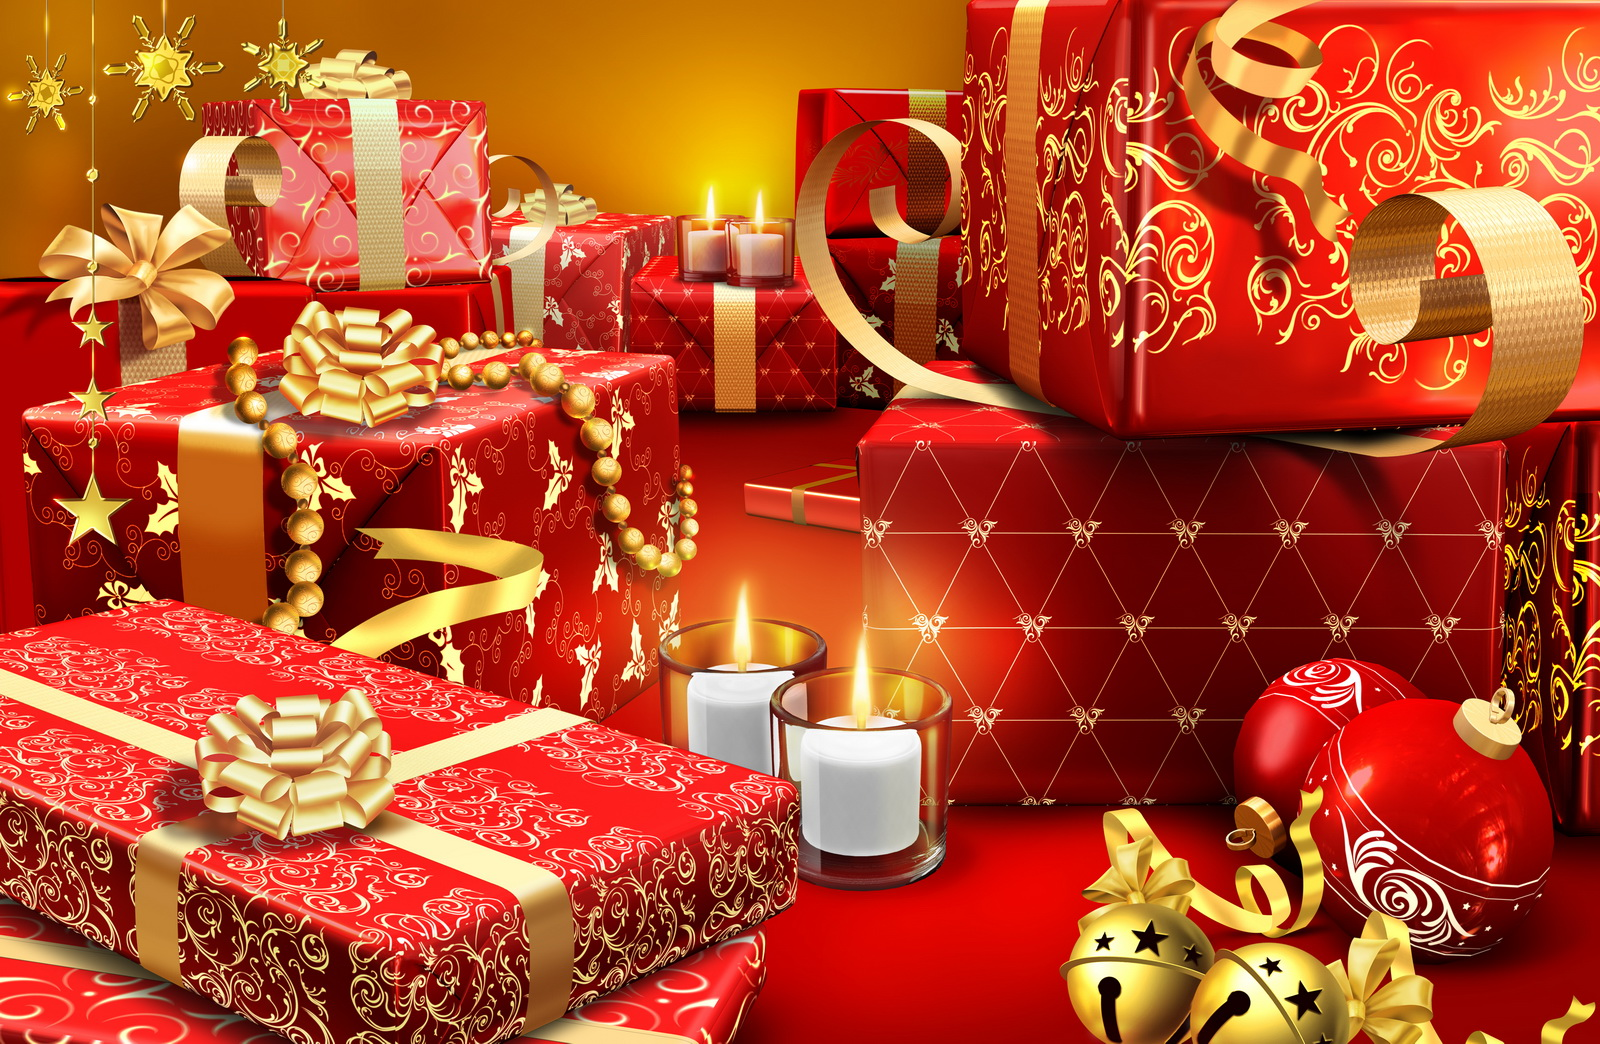 christmas images - photo #40